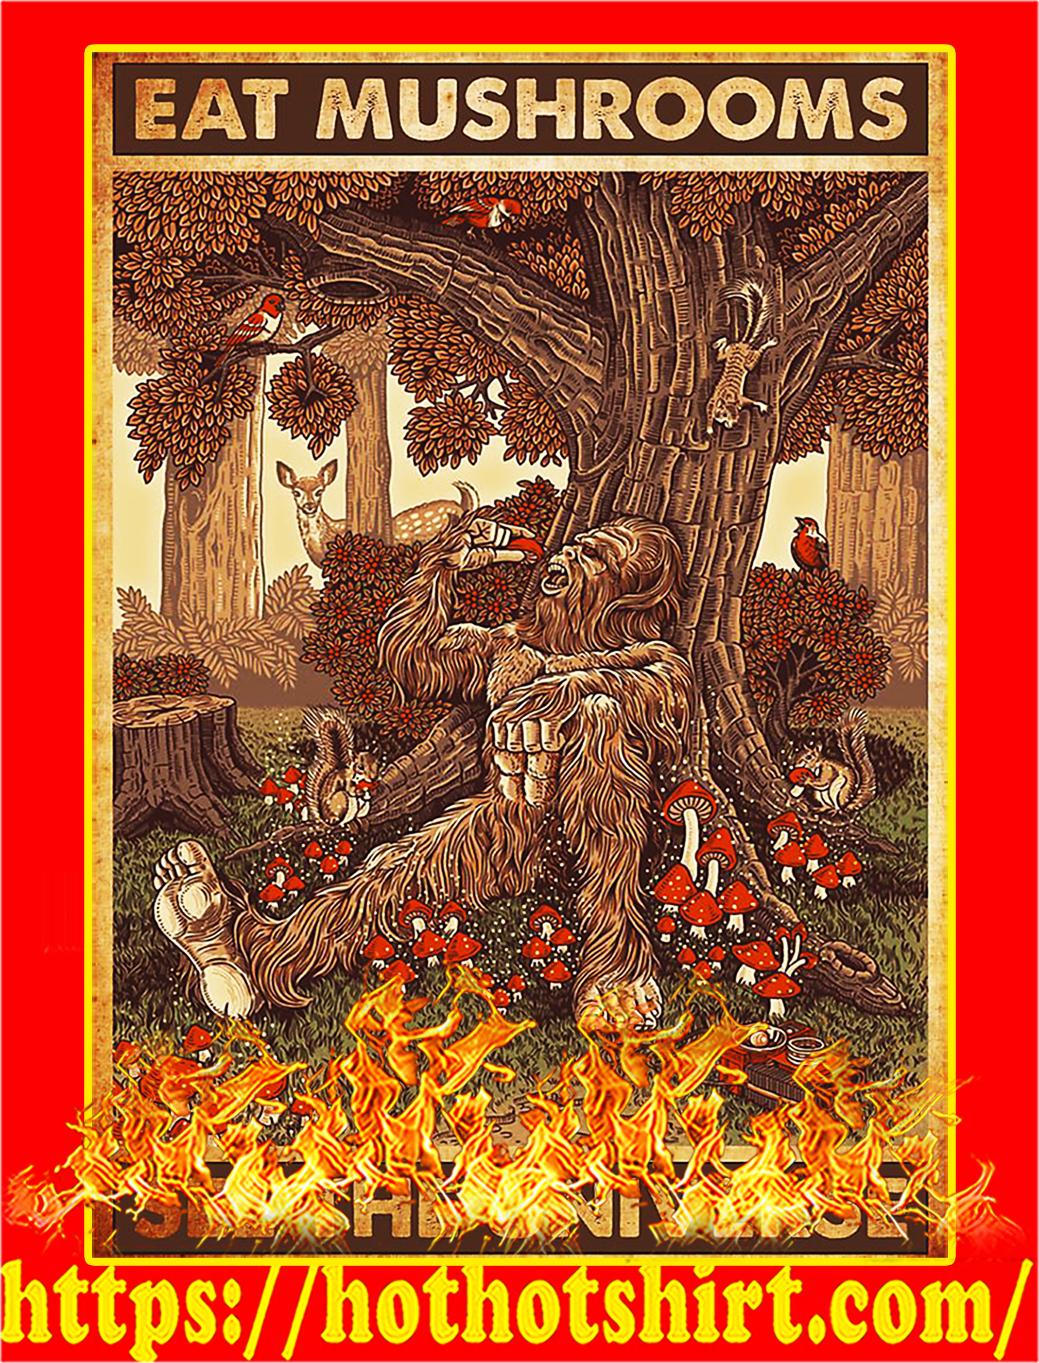 Bigfoot Eat mushrooms see the universe poster - A2